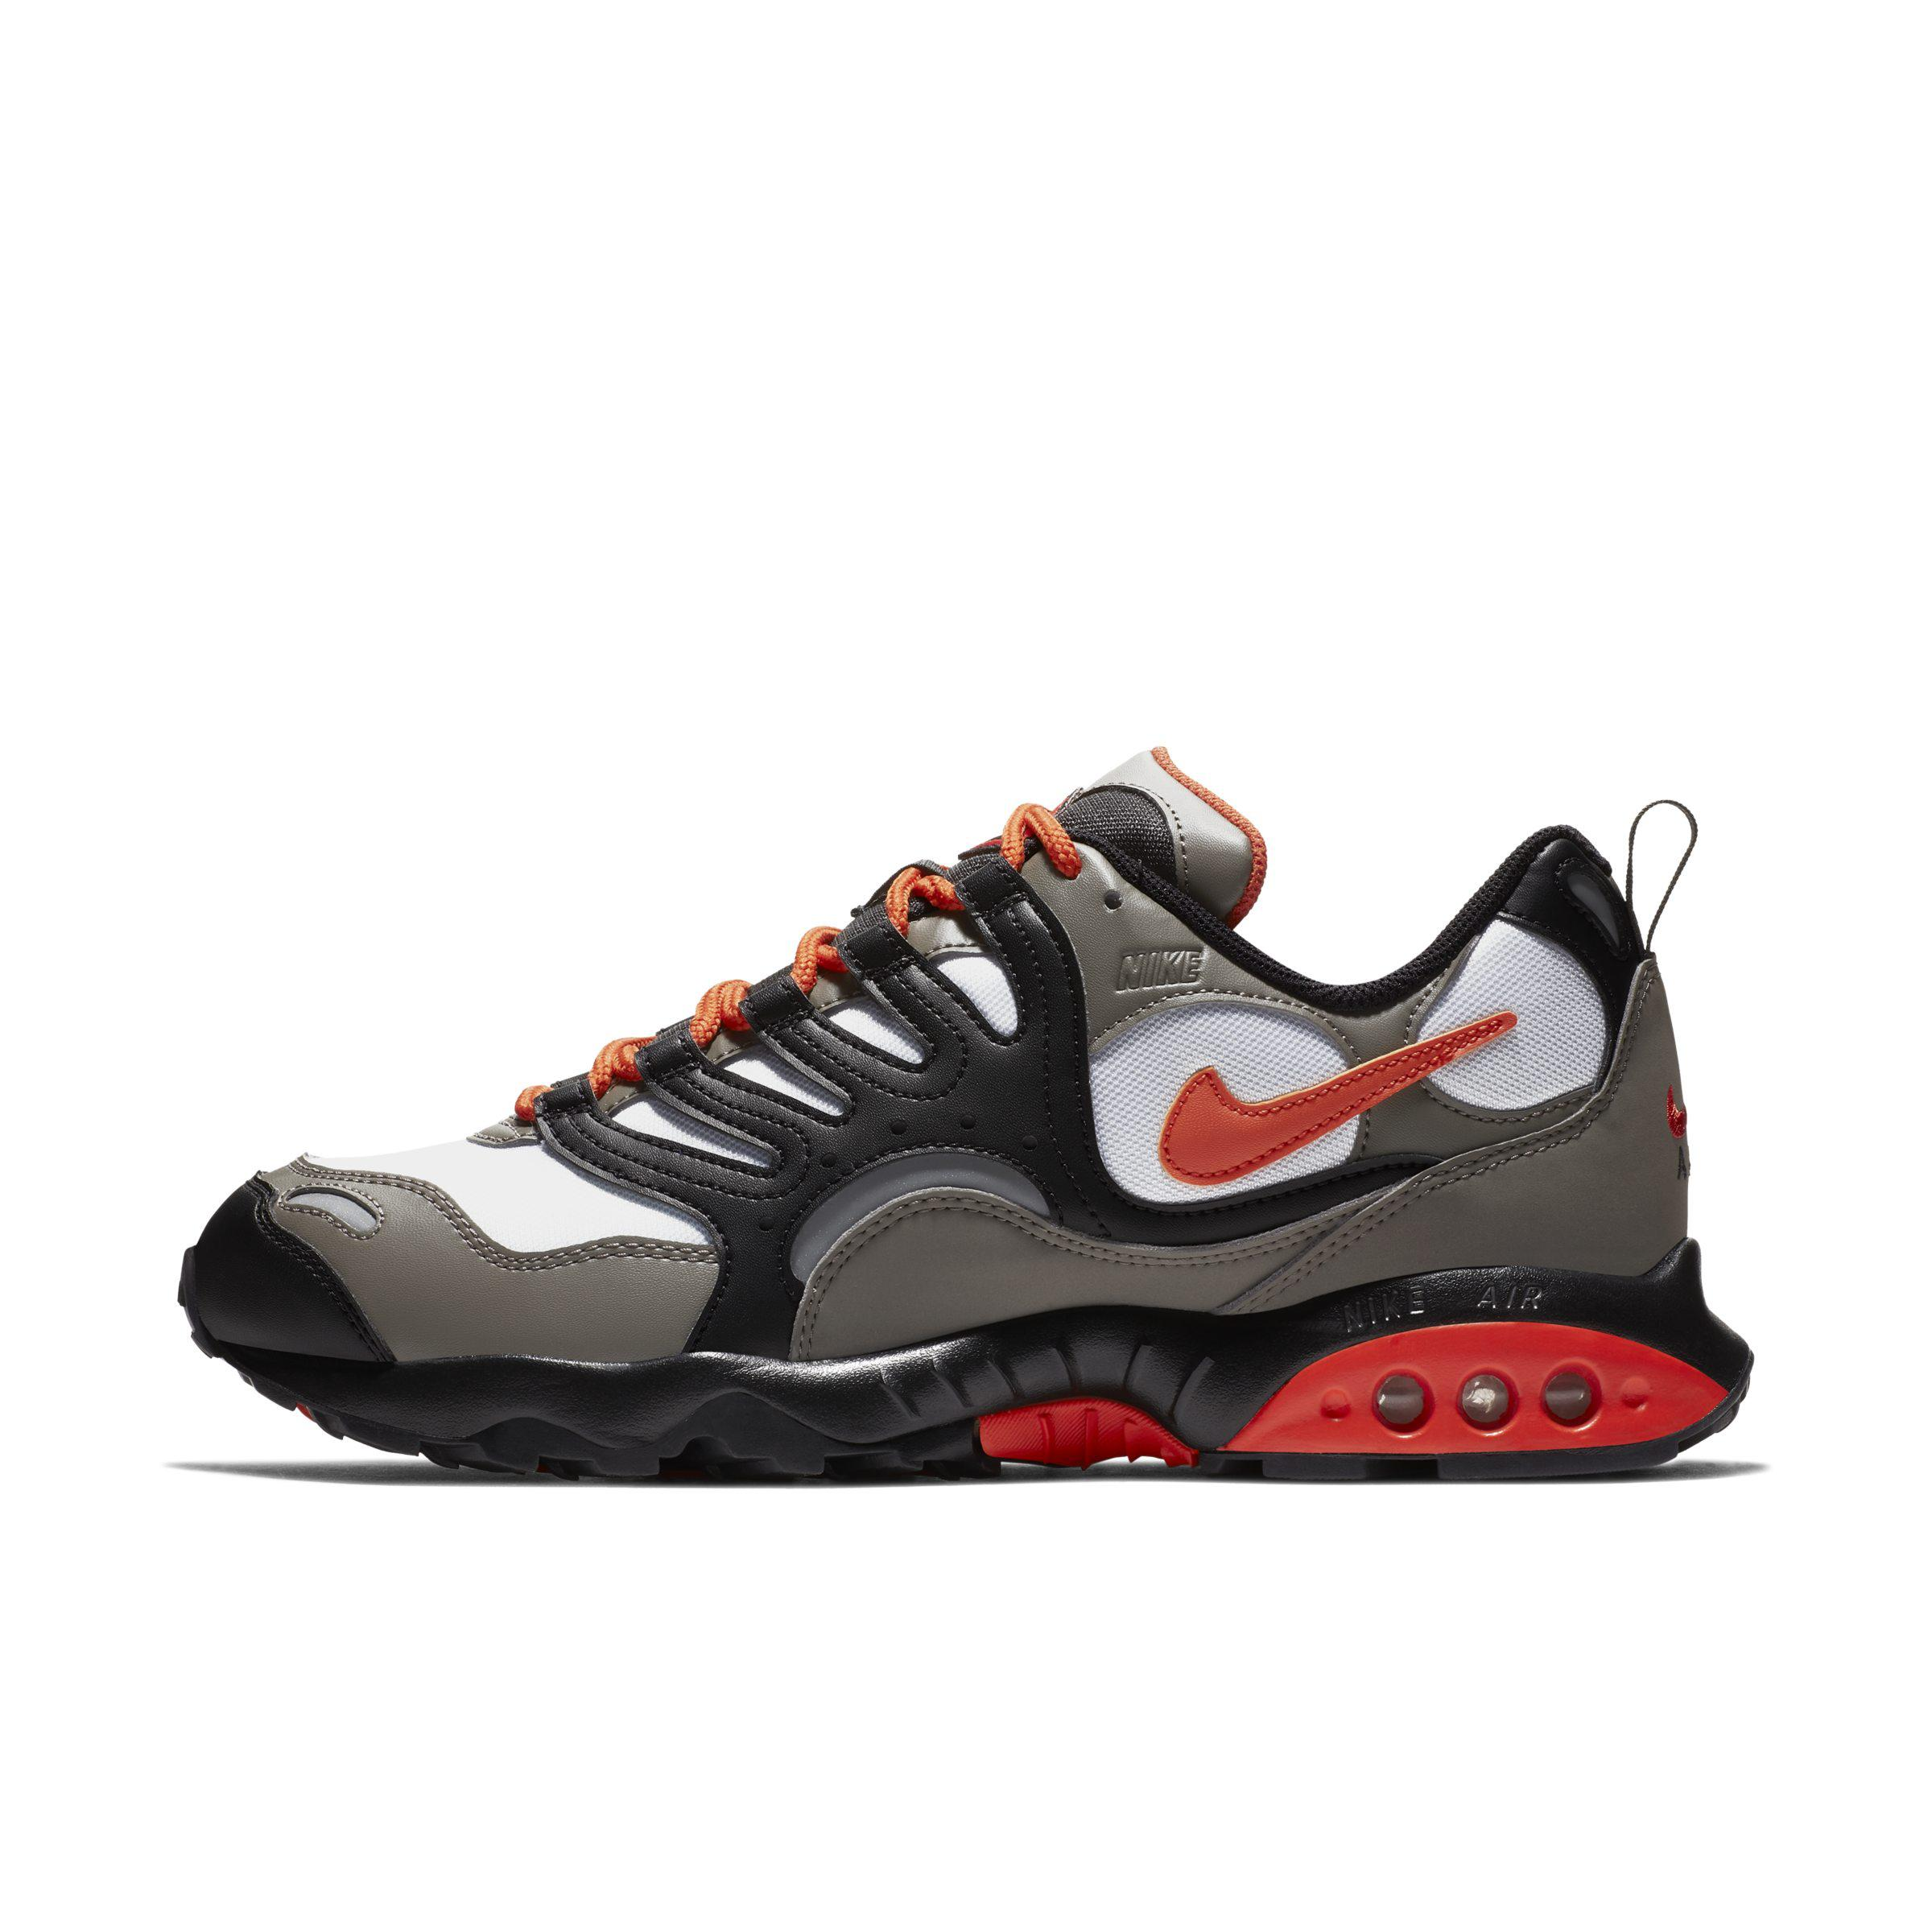 2cf7d55c121e65 Nike Air Terra Humara 18 Shoe in Green for Men - Lyst